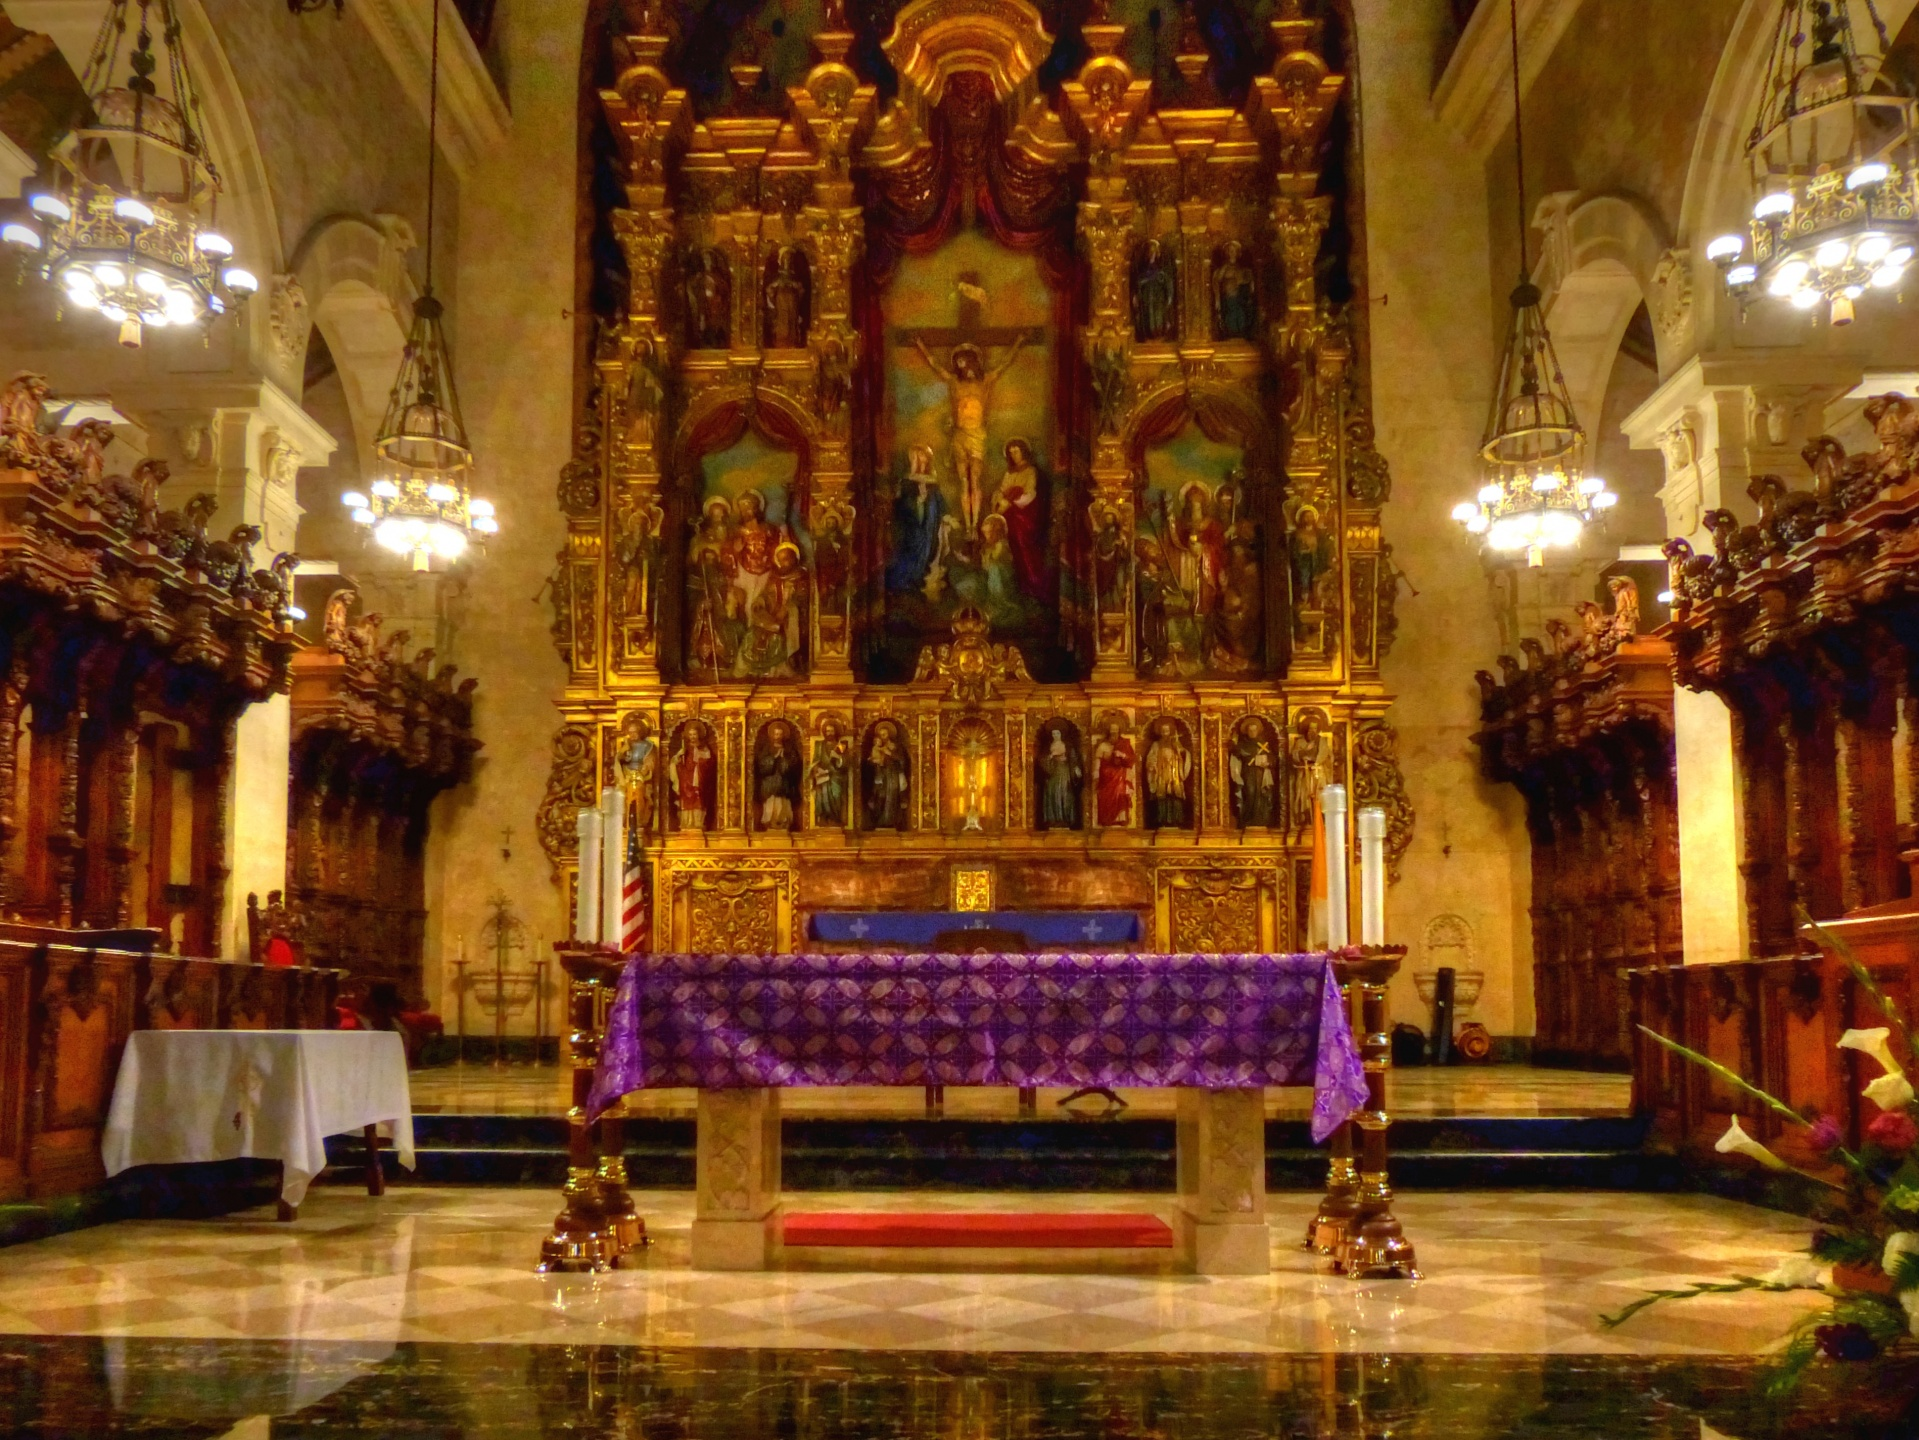 Altar,church,catholic church,ornate,purple draped - free image from  needpix.com